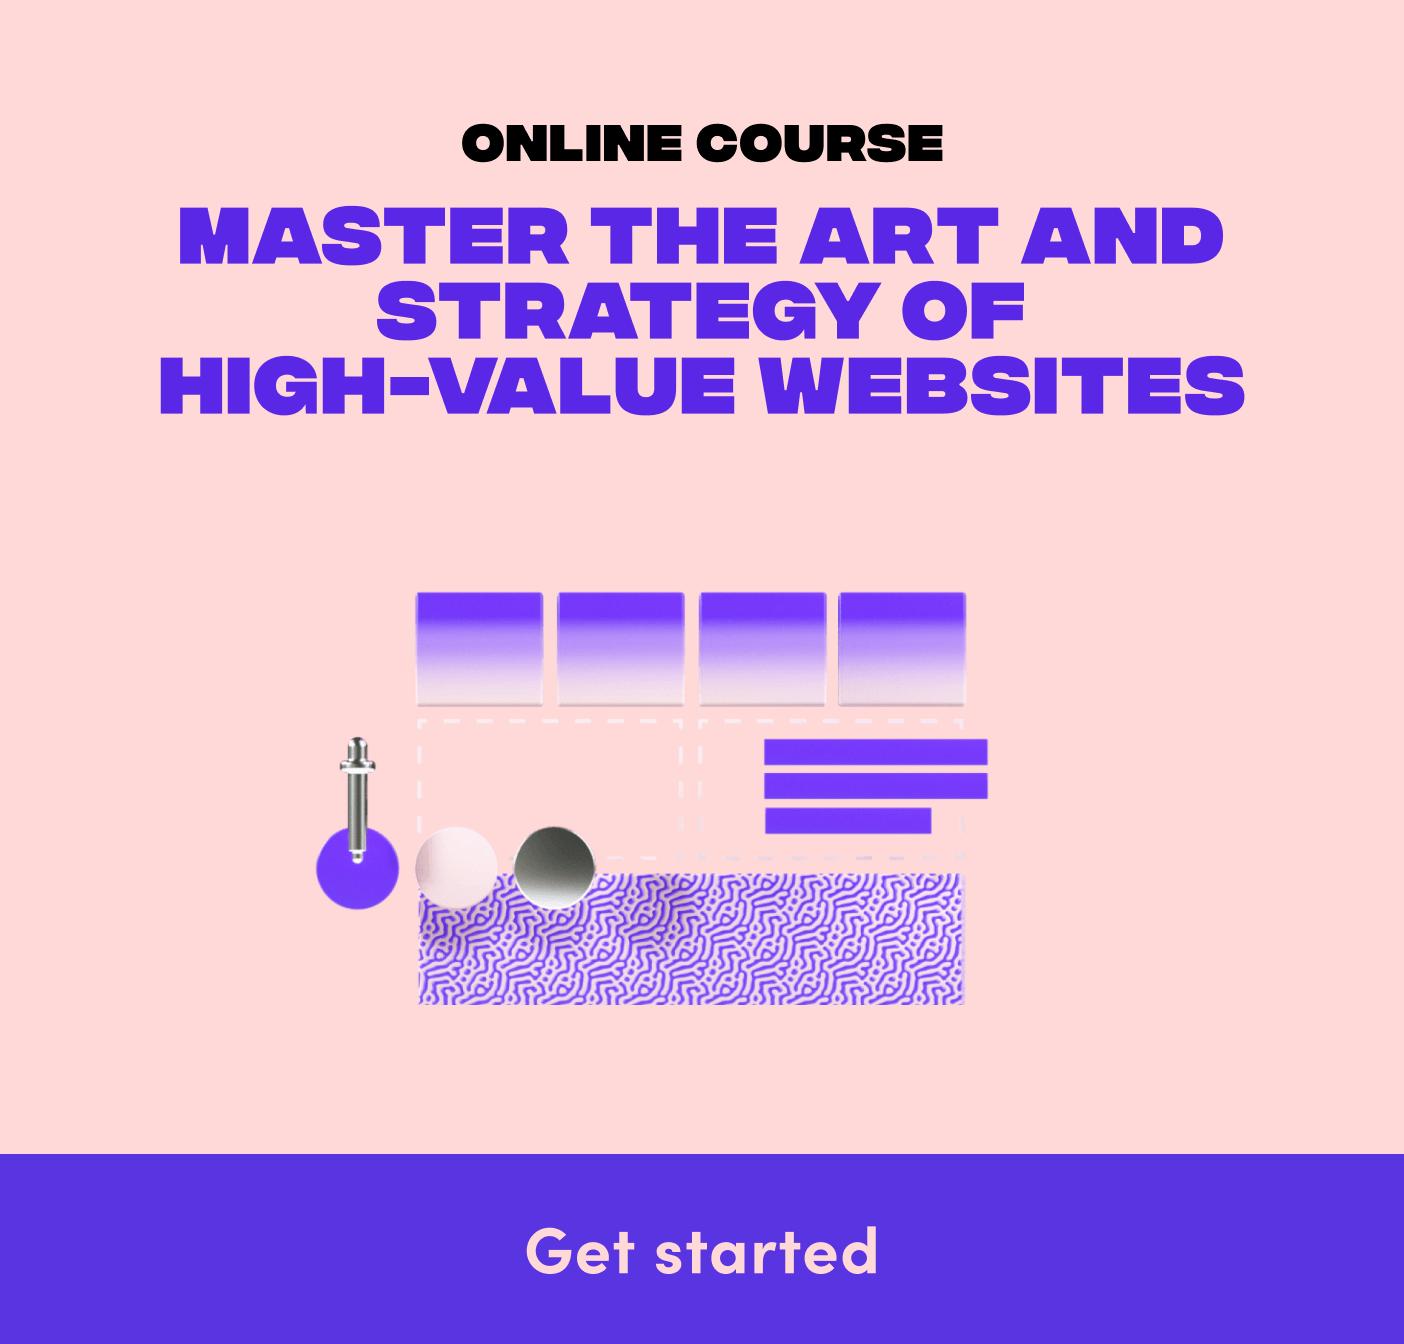 https://www.flux-academy.com/courses/10k-website-process